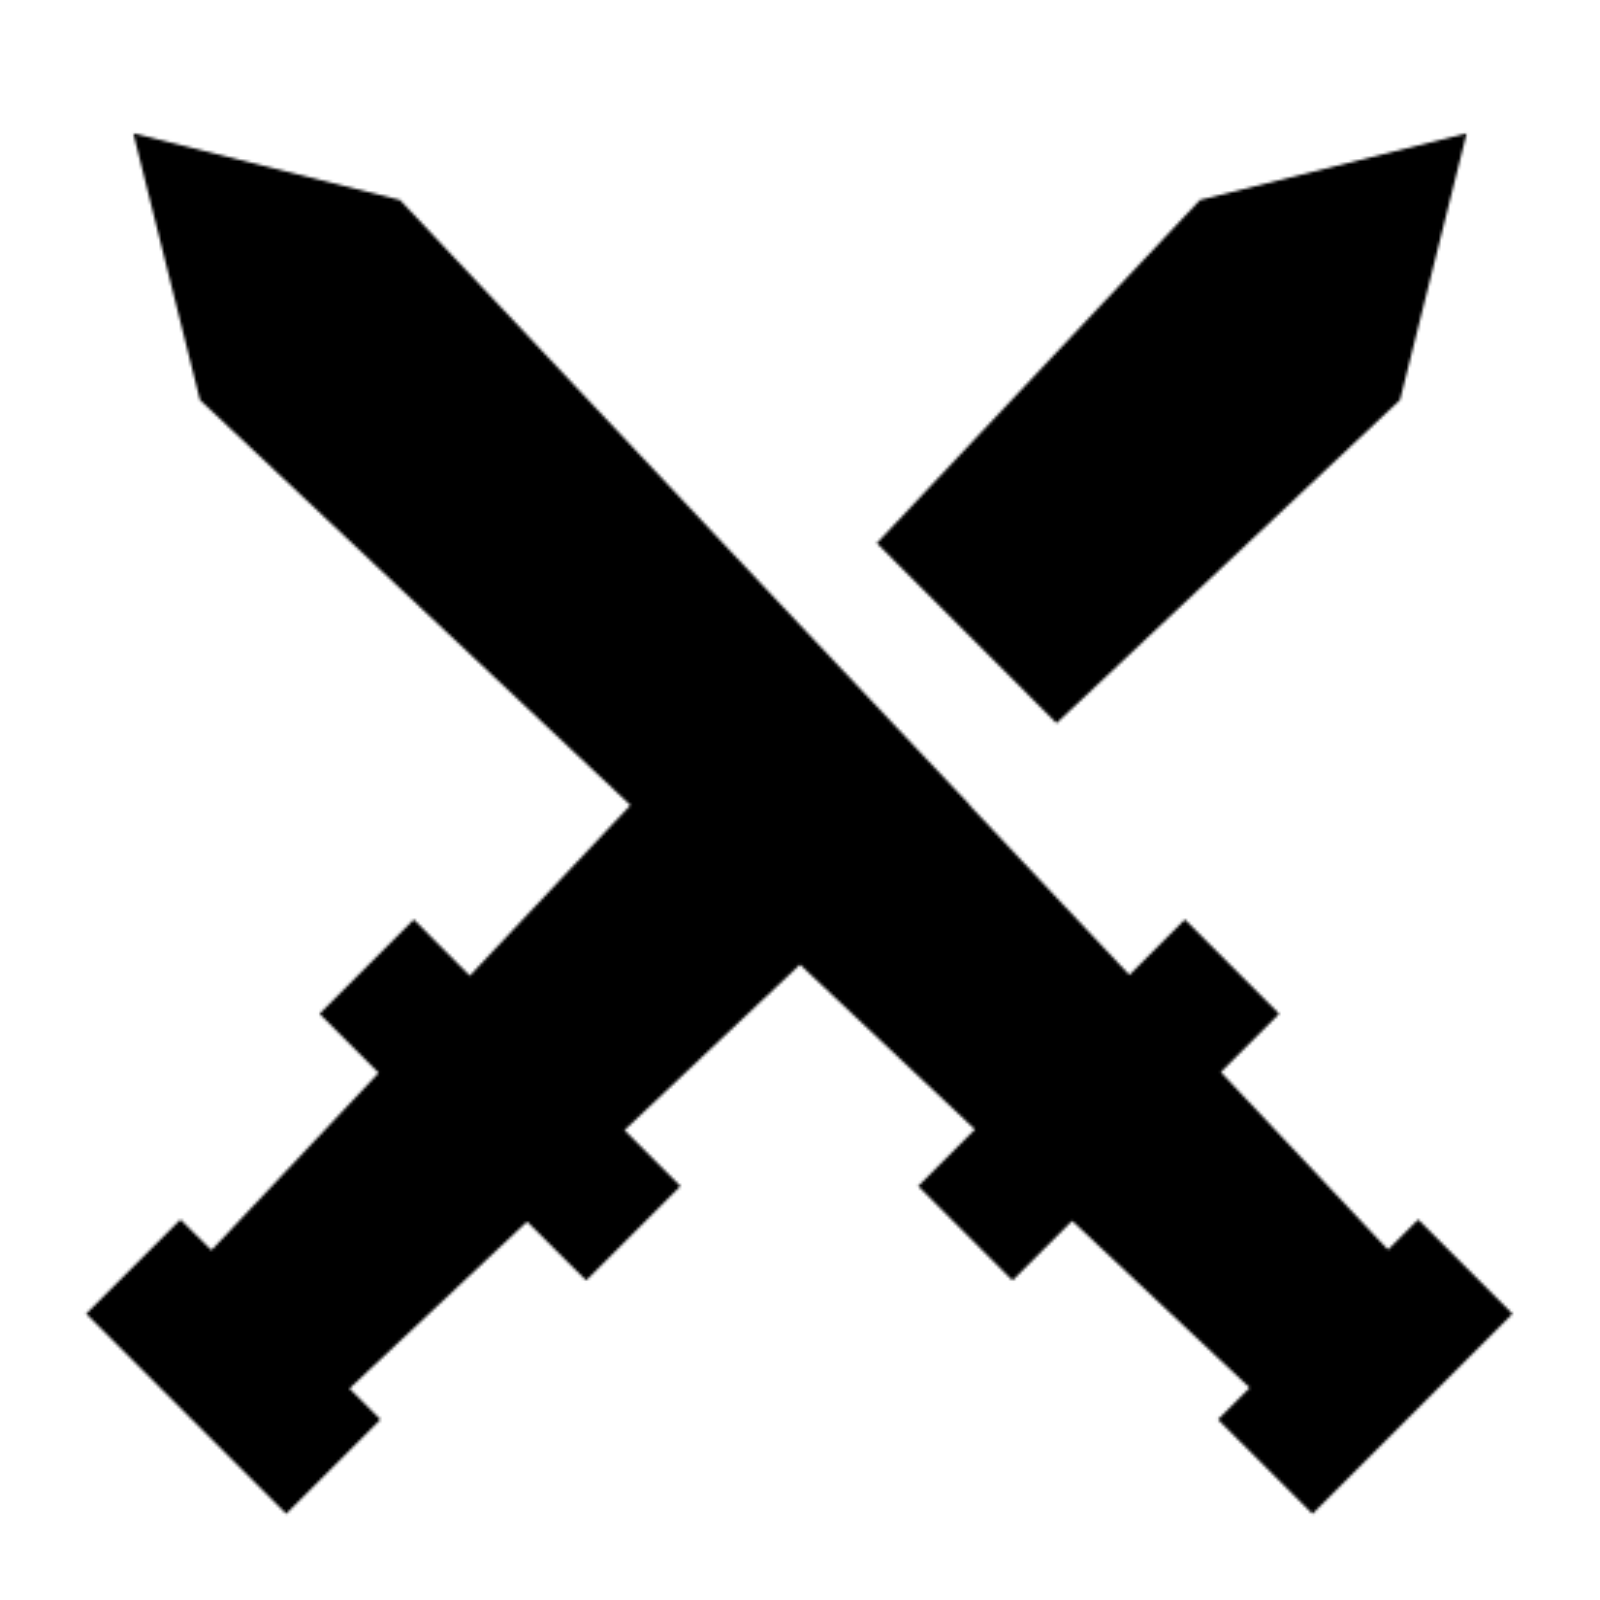 bitwa icon